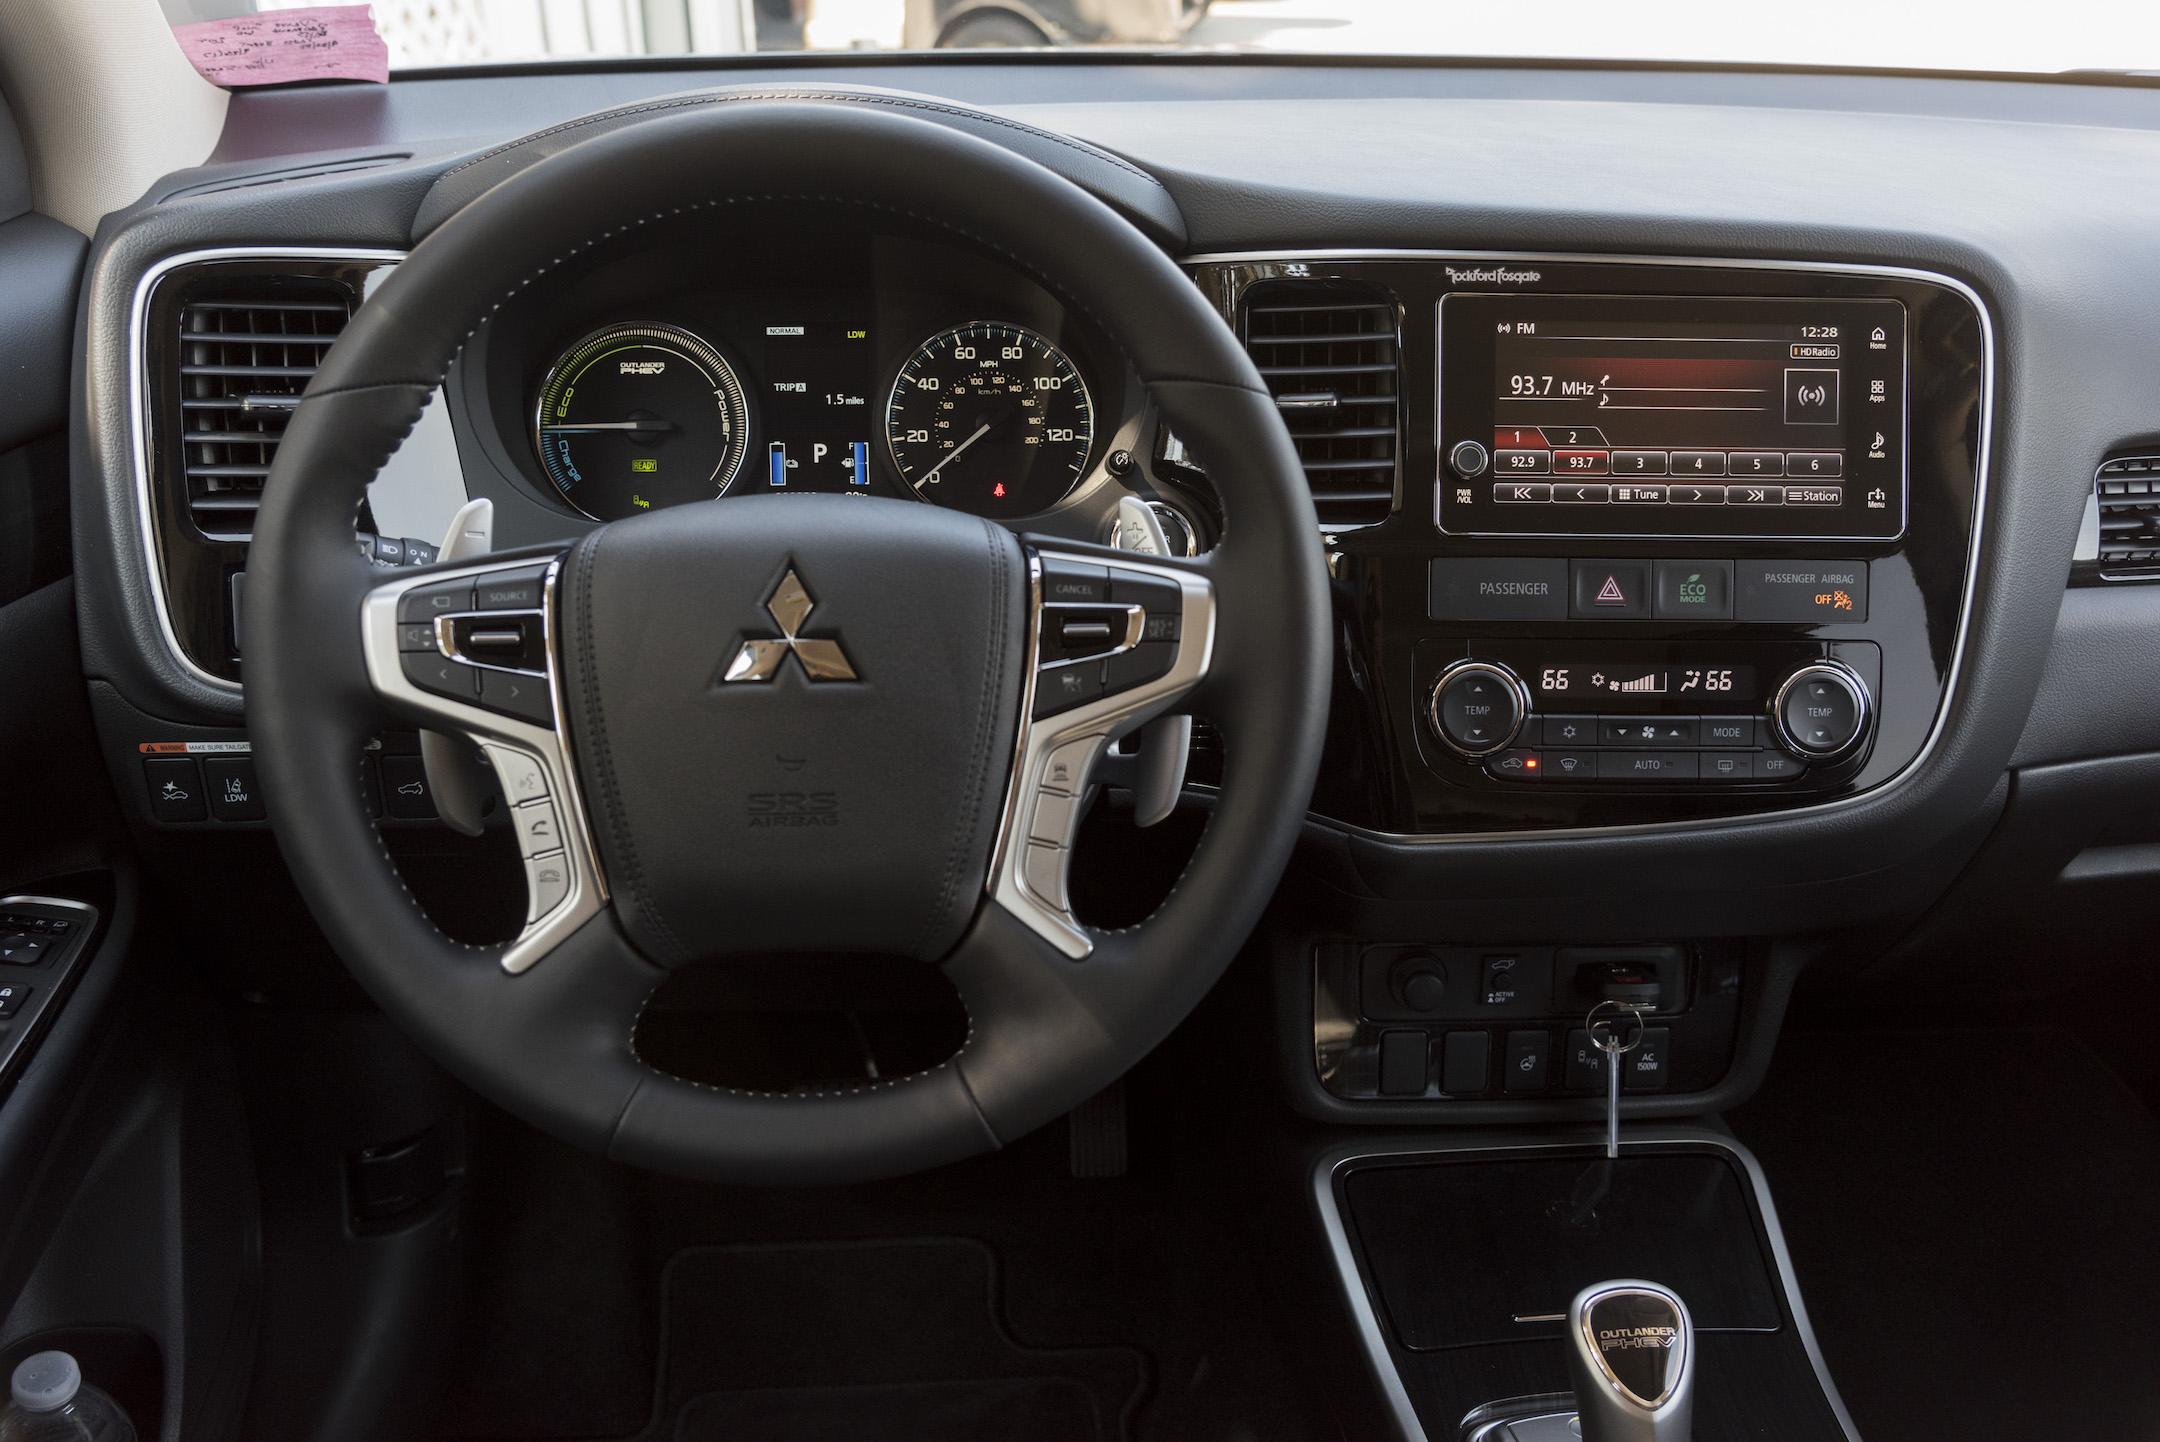 2018 Mitsubishi Outlander PHEV Press Launch